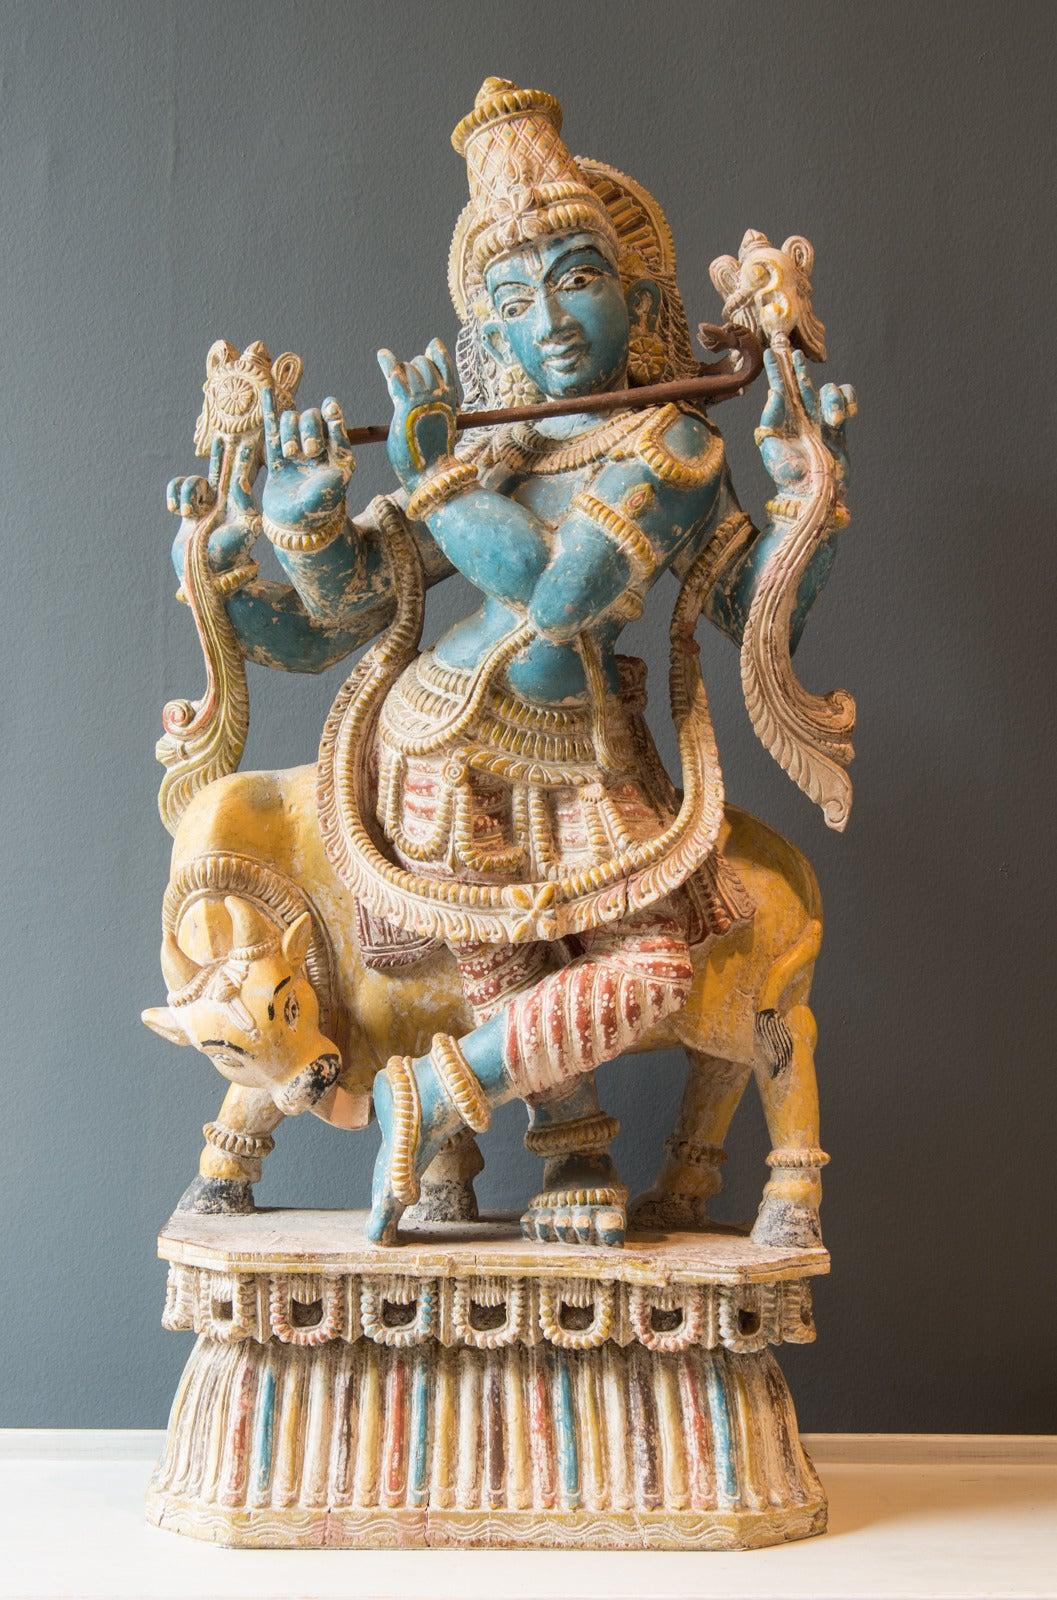 Polychrome Statue Depicting Hindu God Vishnu And Cow -2233